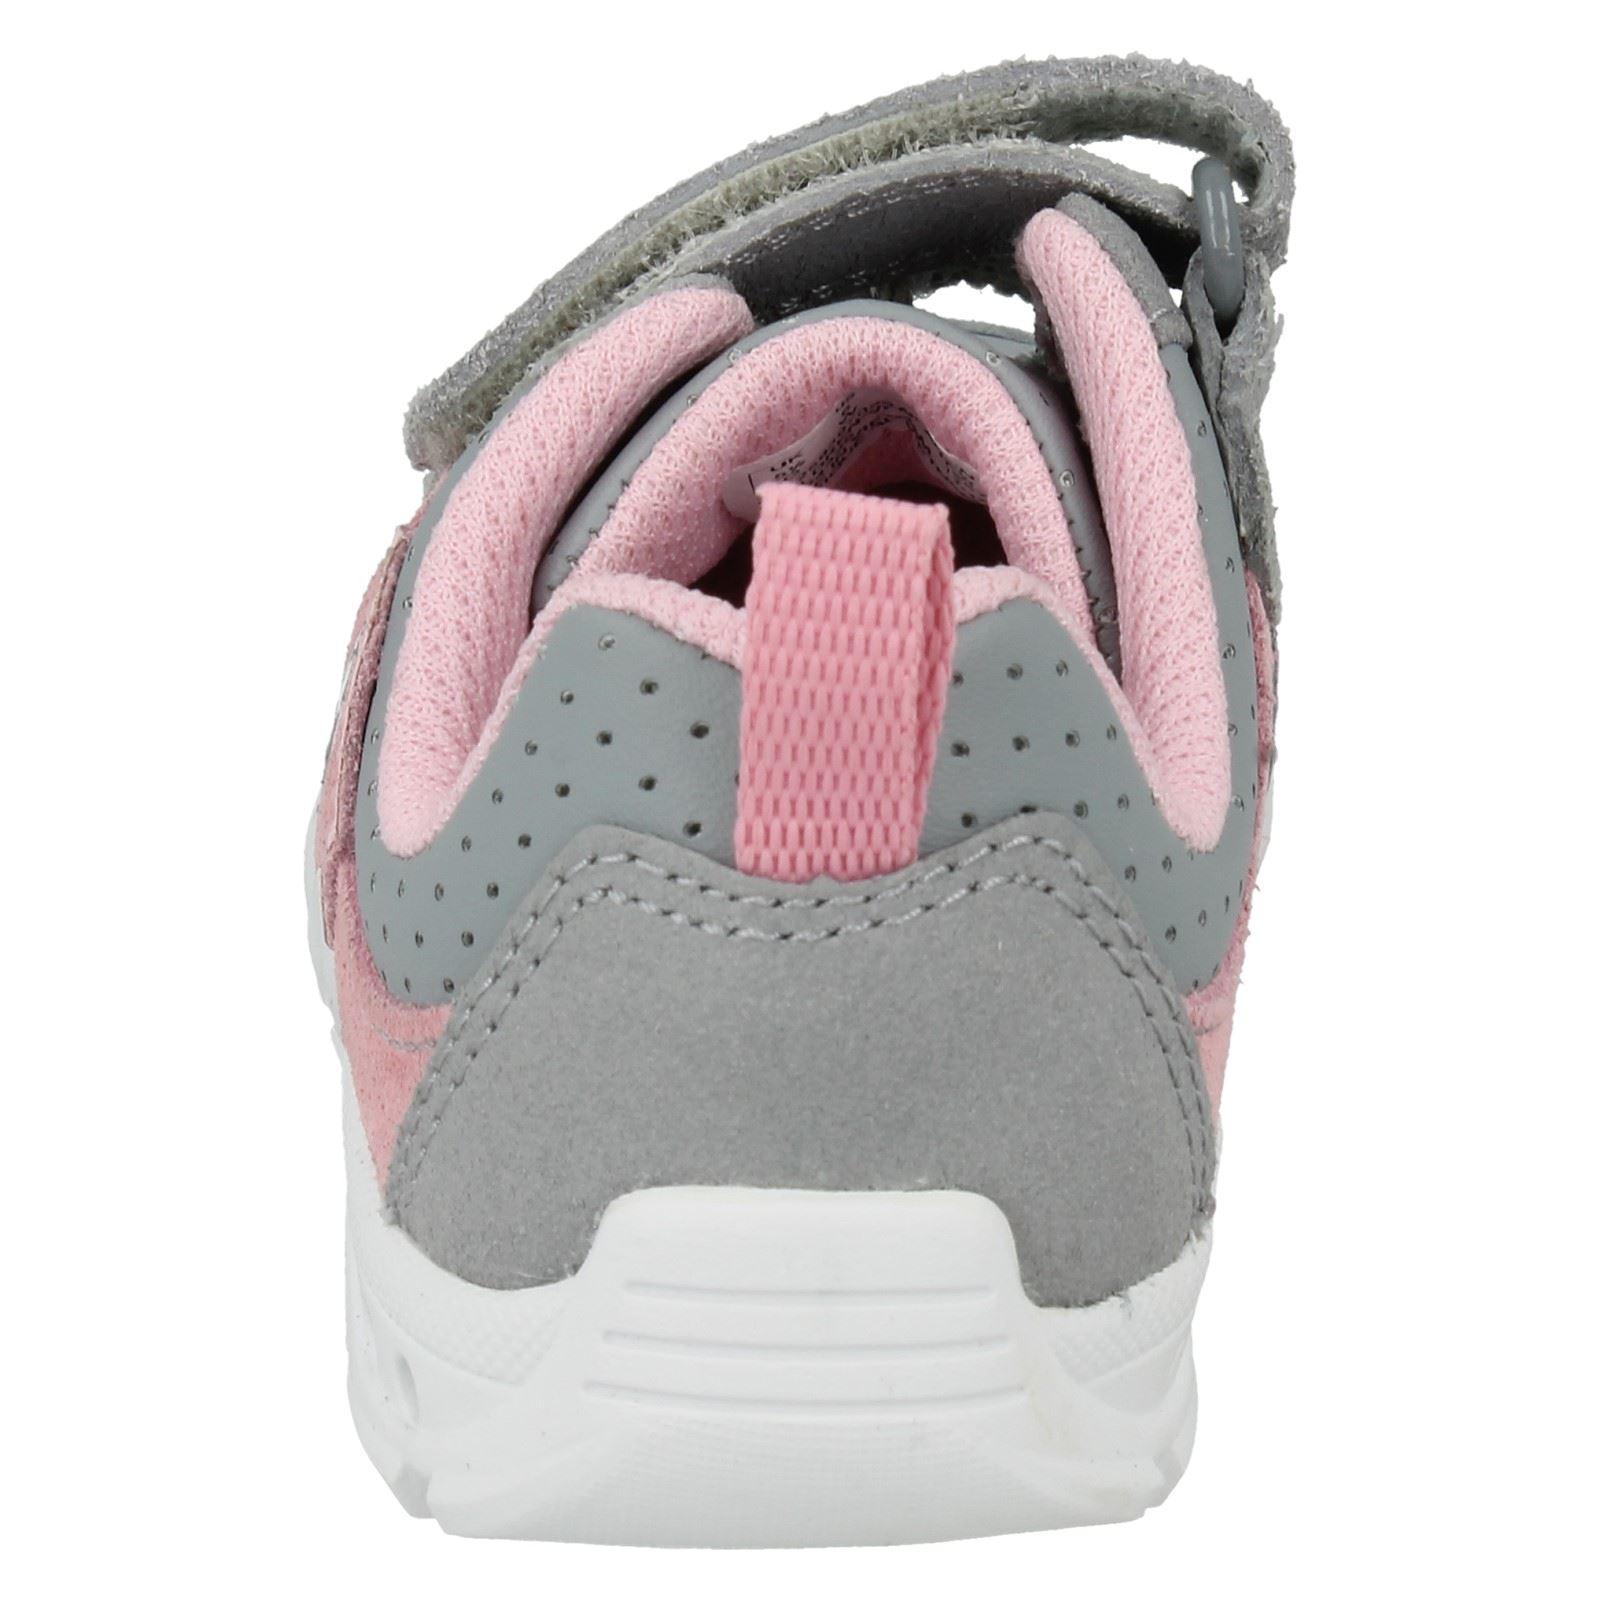 Chicas Clarks Primero Zapatos Estilo Brite Wizz Fst